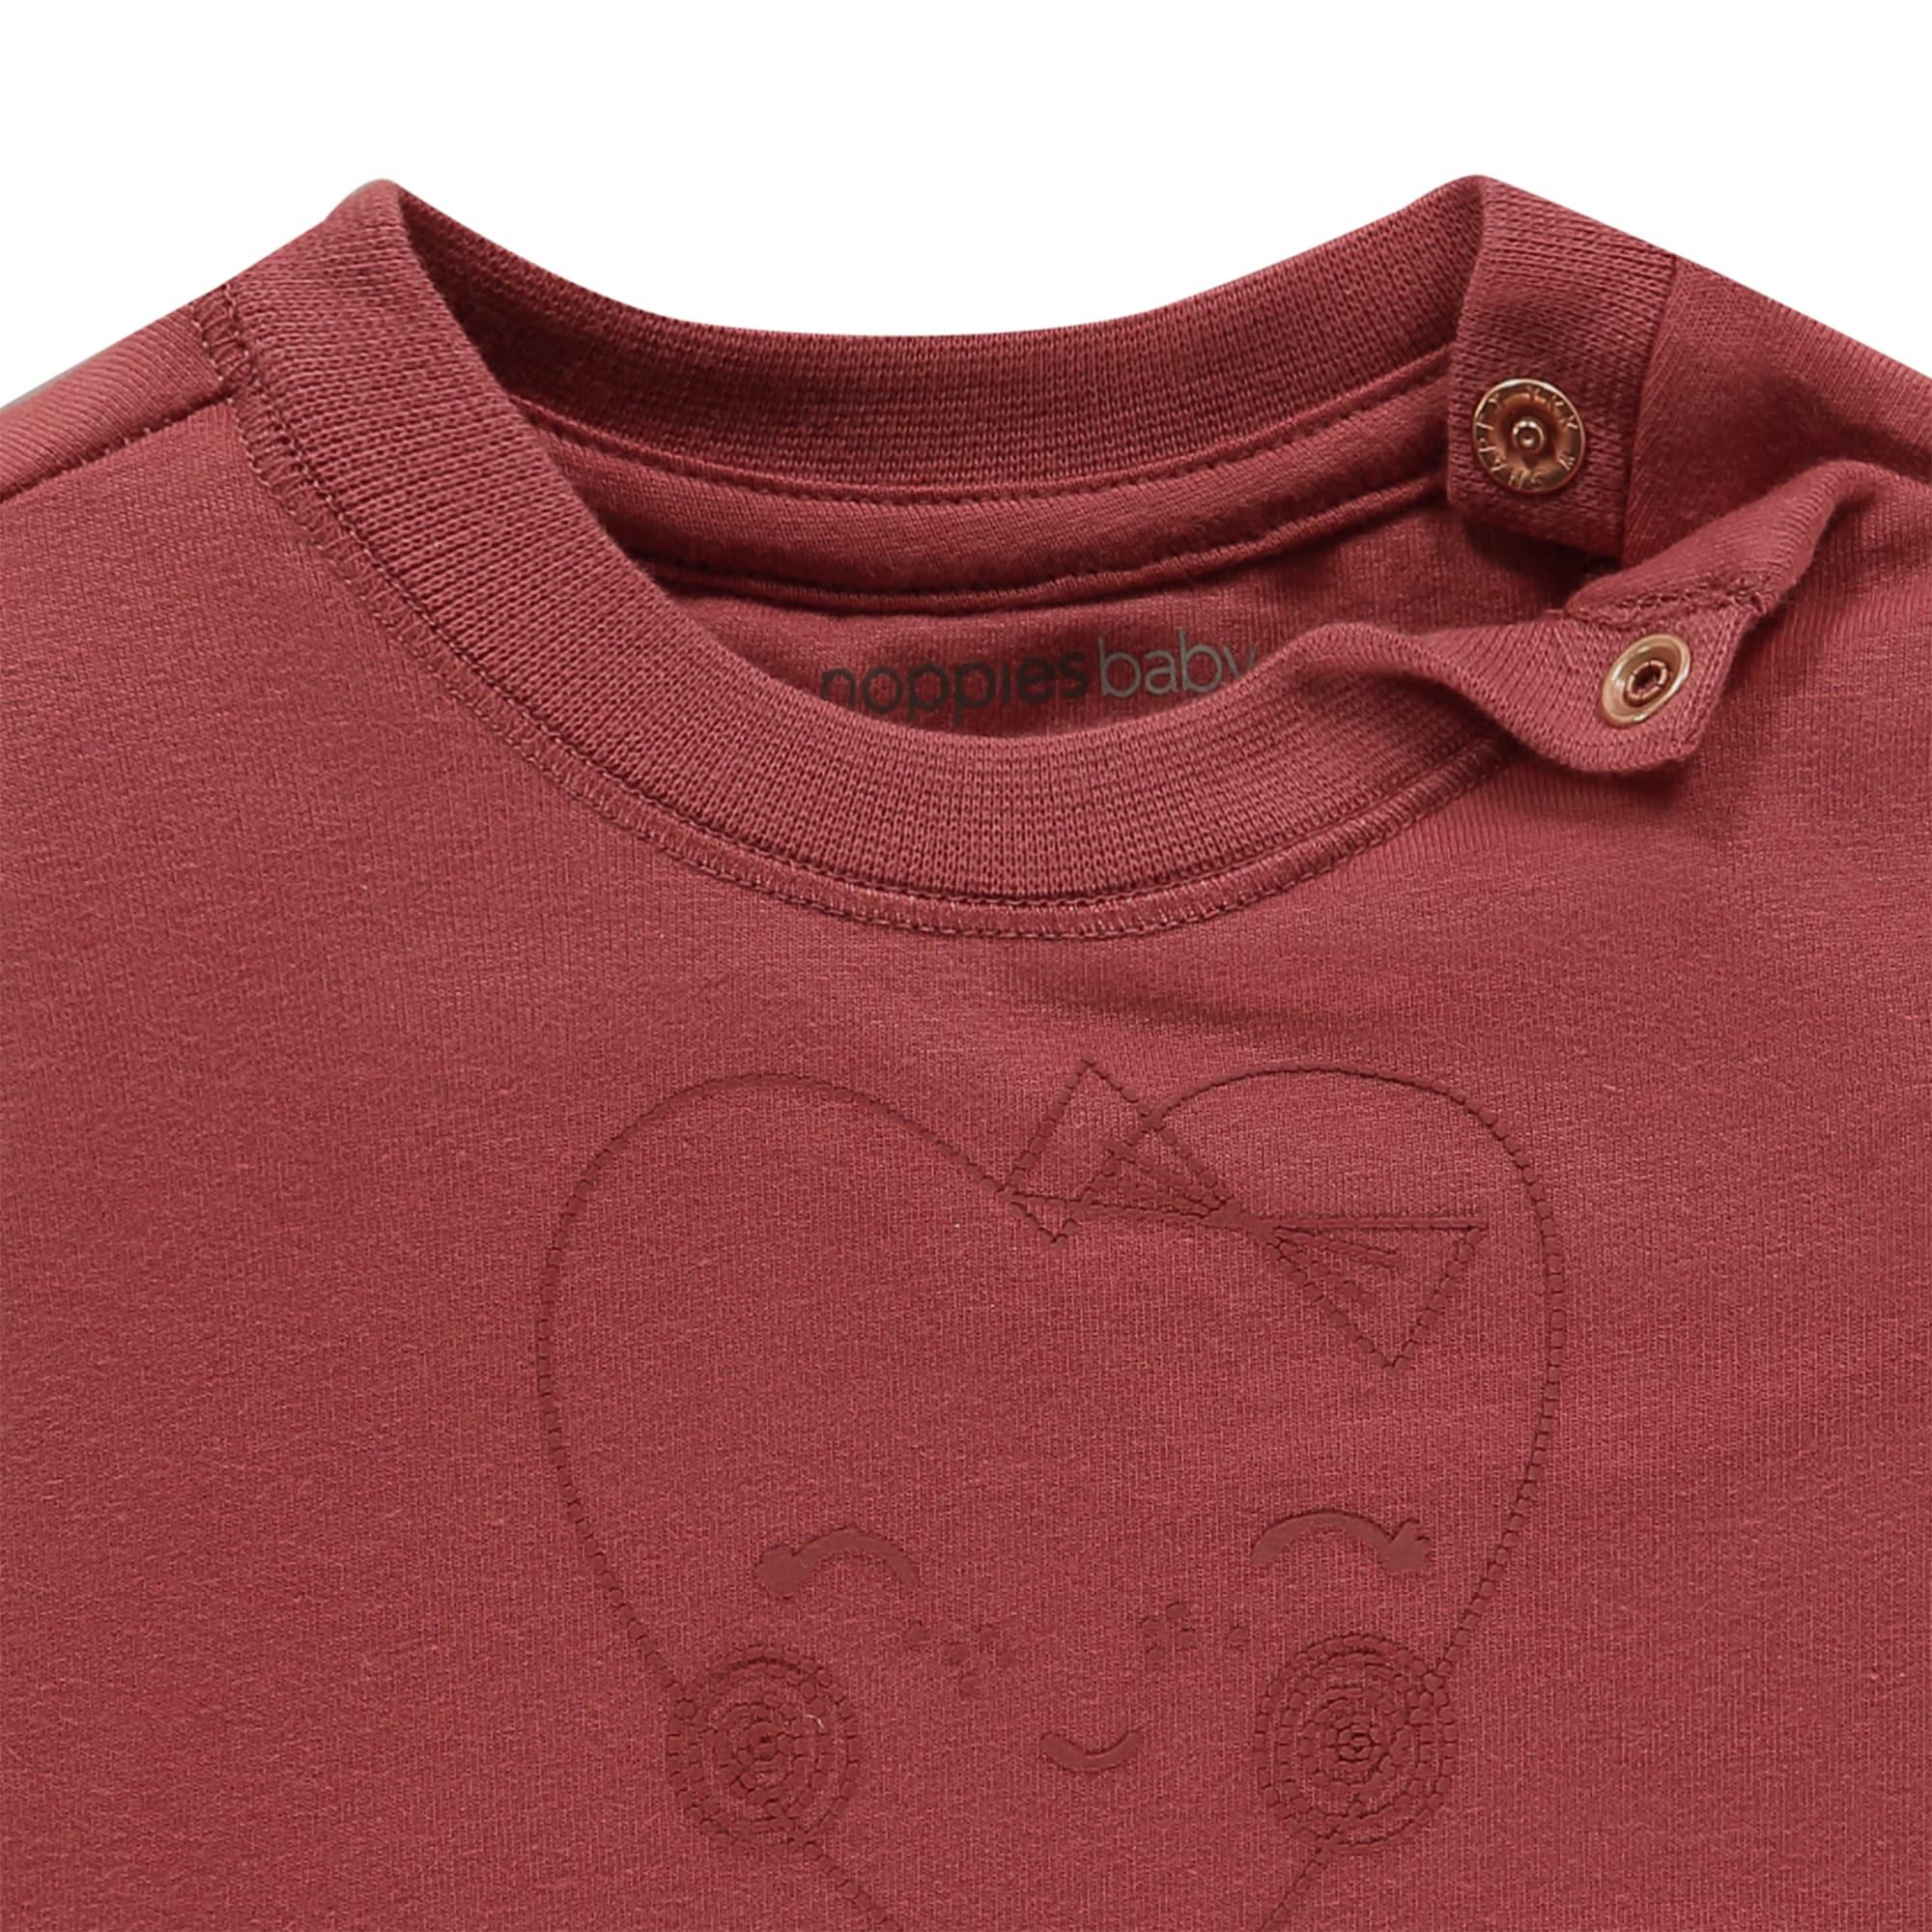 Babyoberteile - Sweater - Onlineshop ABOUT YOU